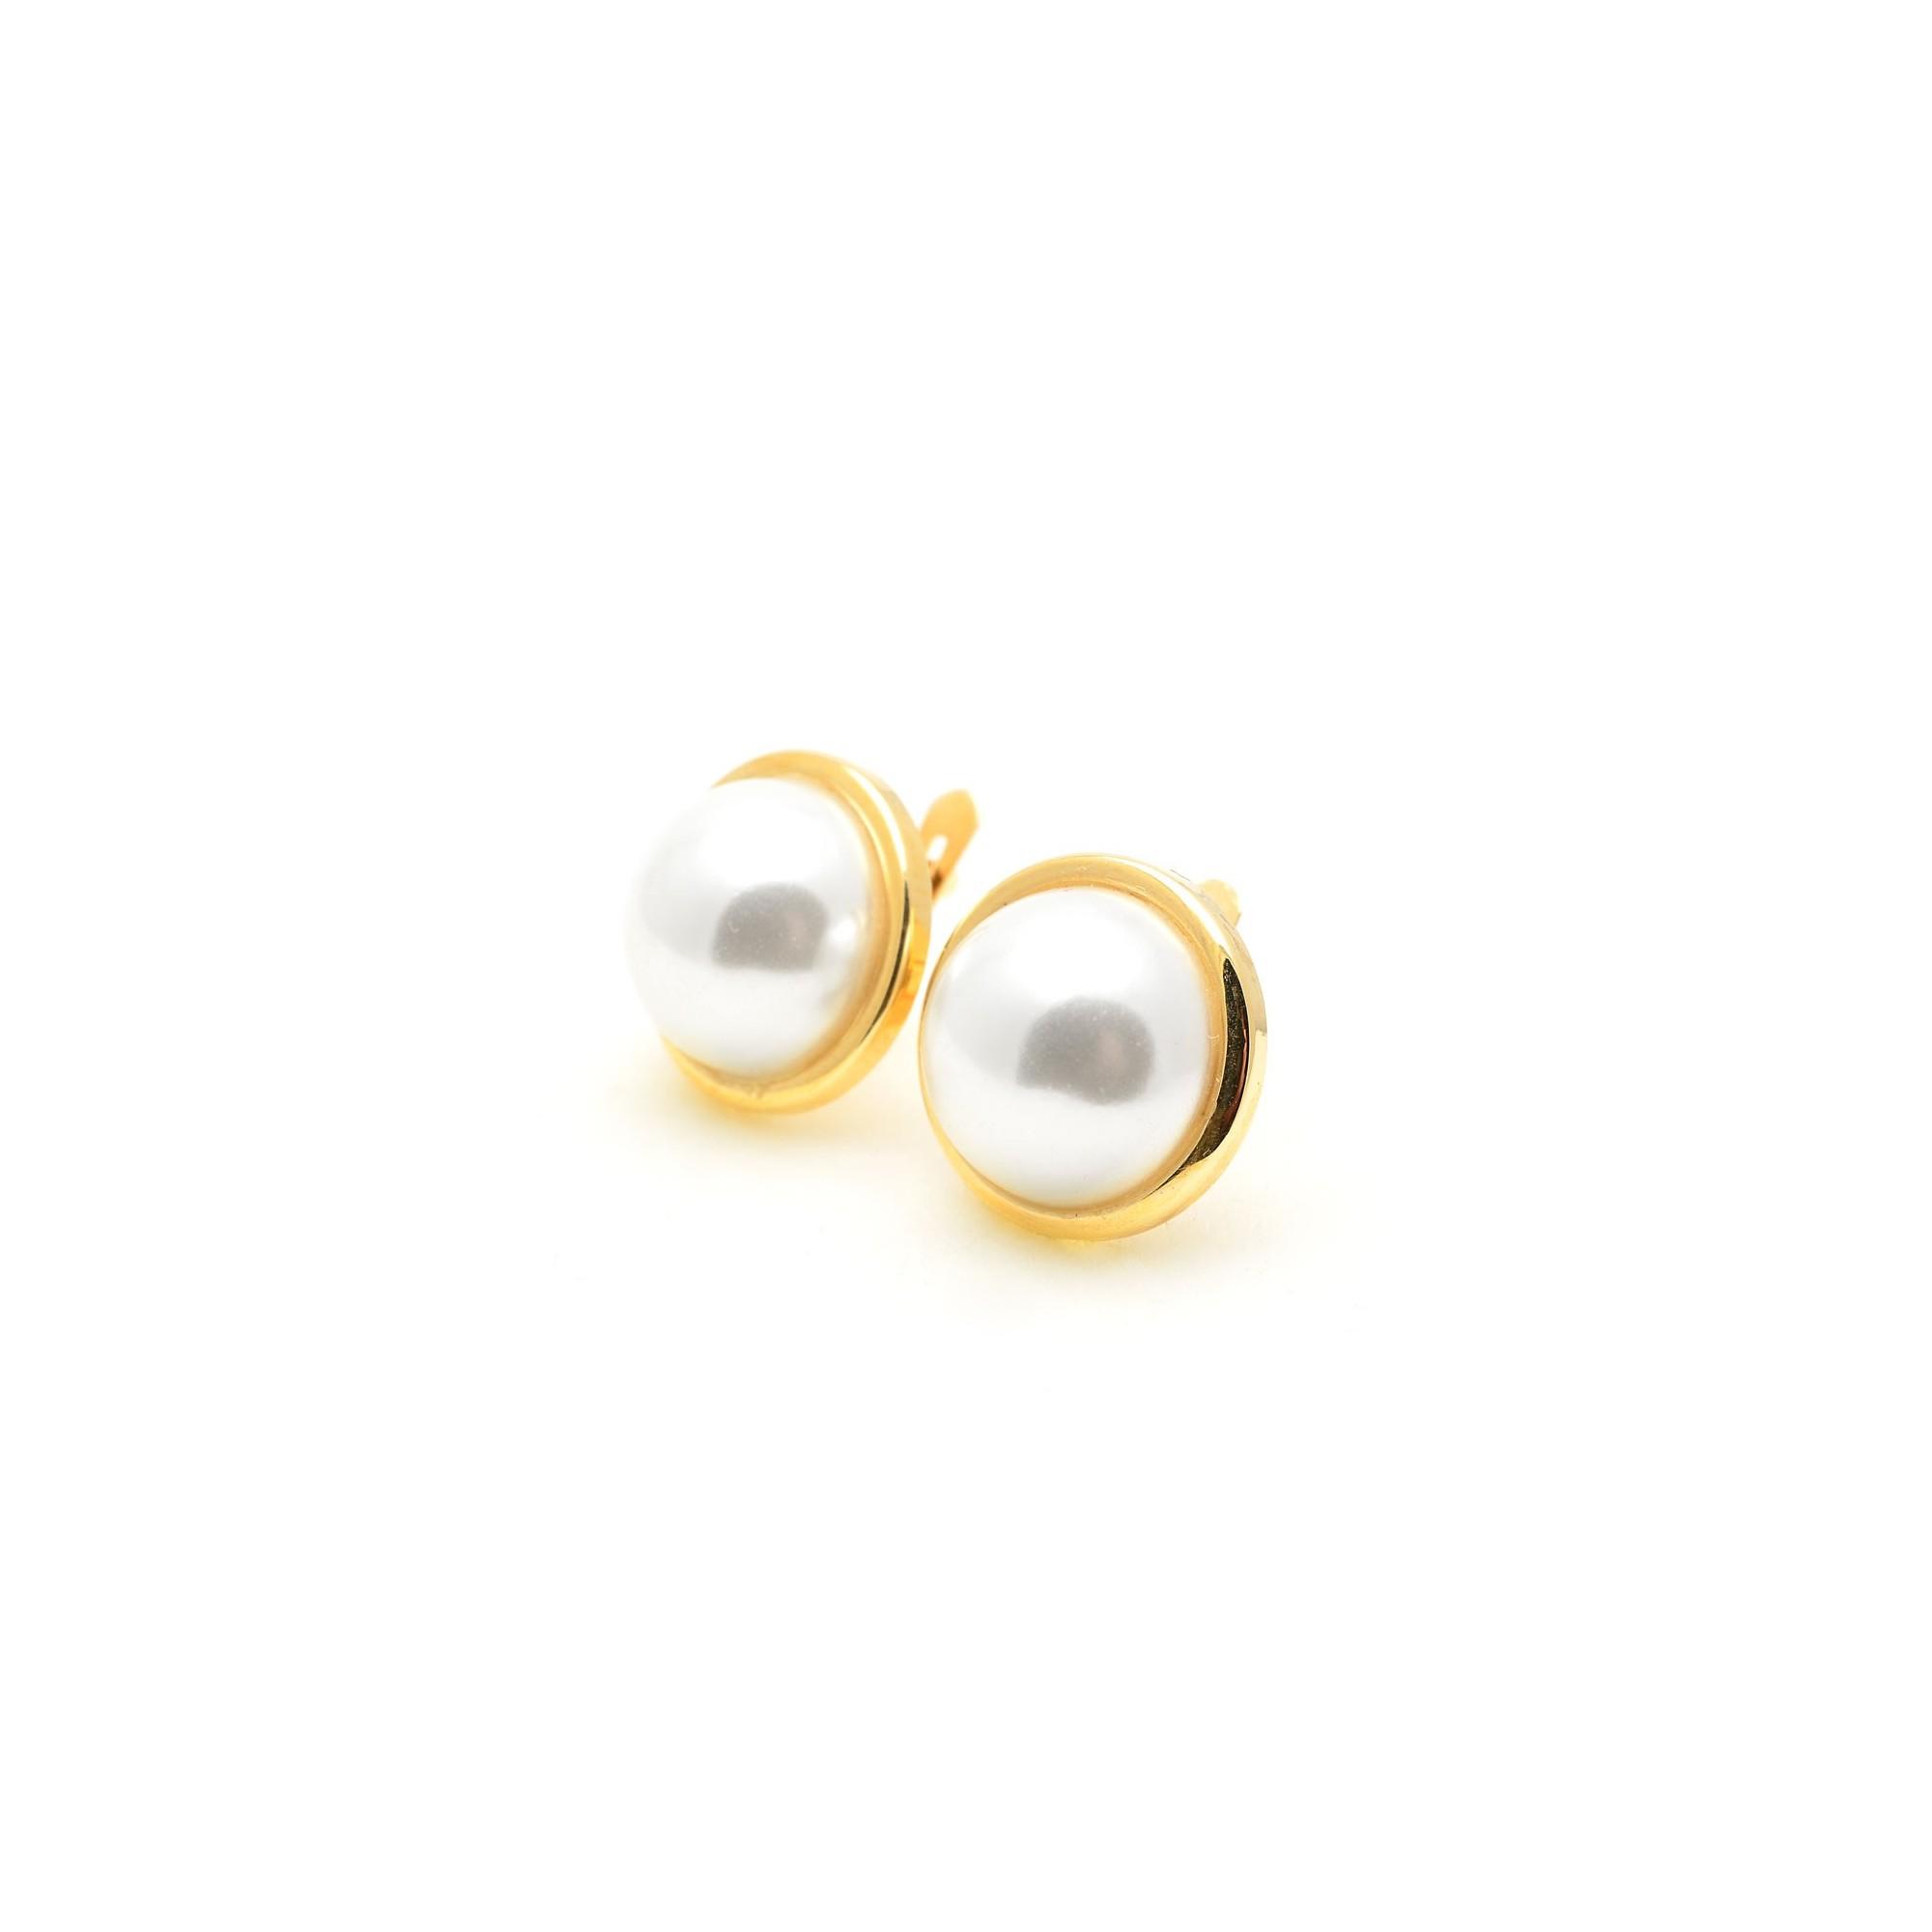 14abce398f11 Pendientes Oro Mujer Perla Japonesa